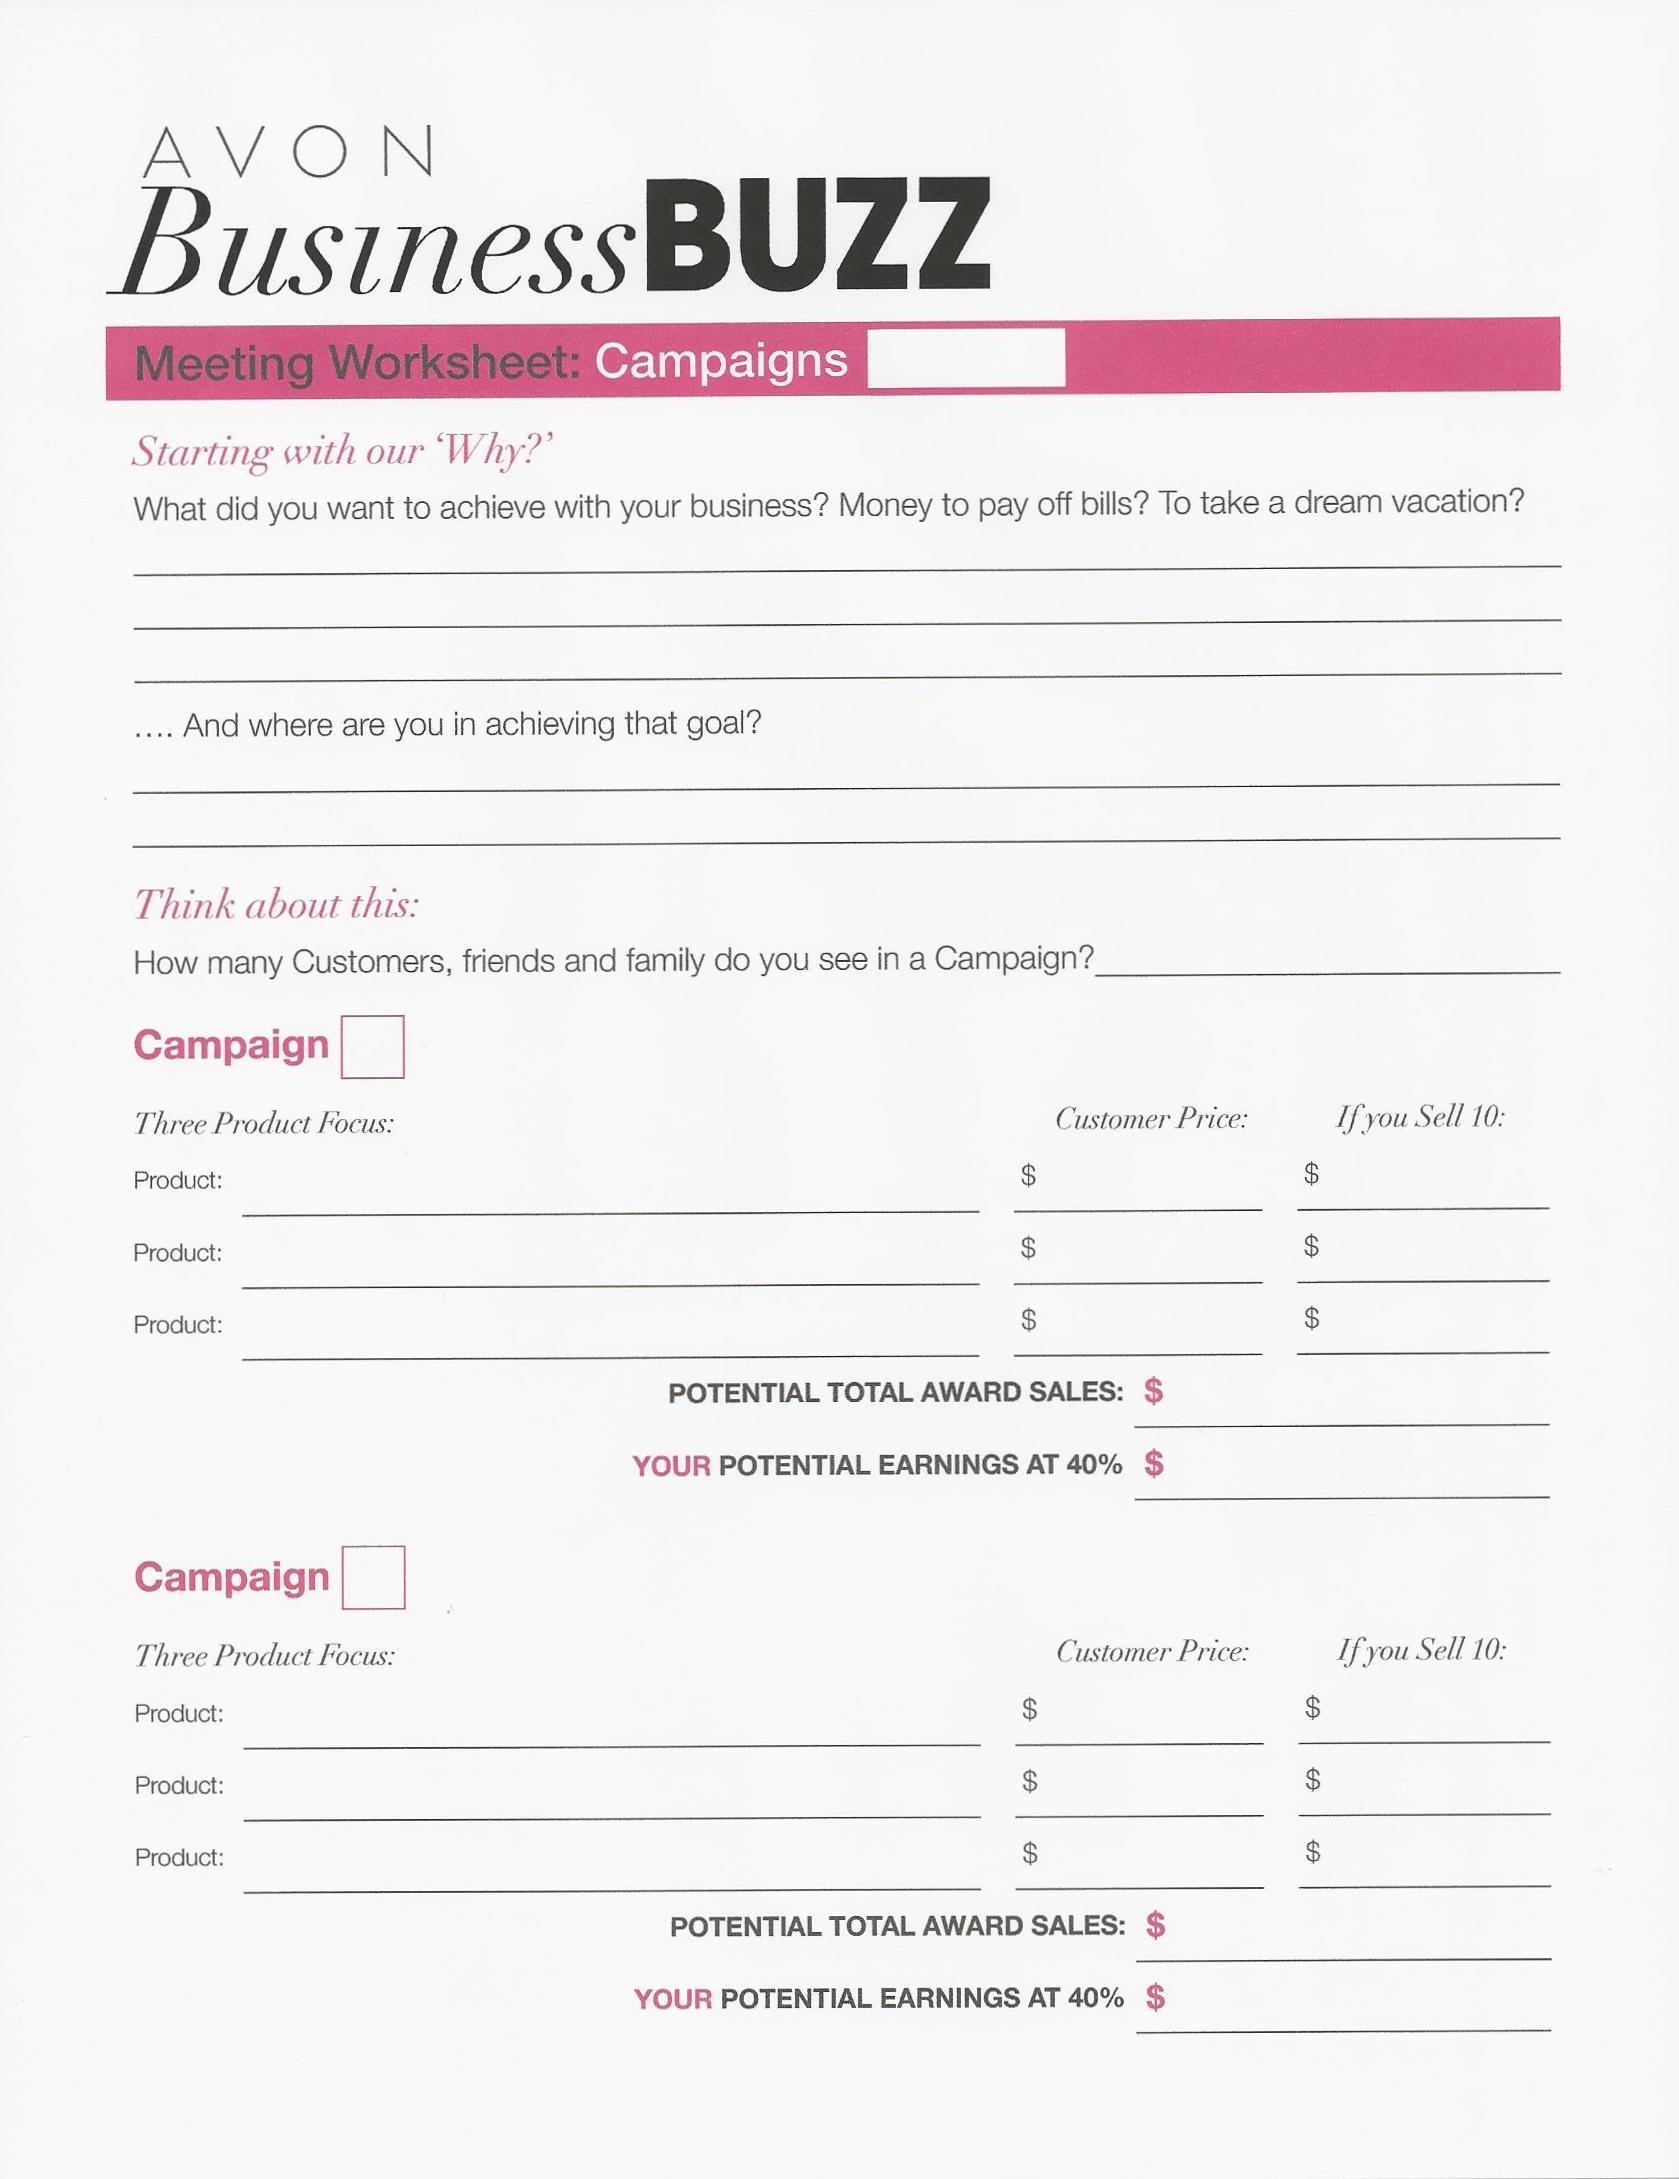 avon tarjetas de visita and negocio on pinterest. Black Bedroom Furniture Sets. Home Design Ideas